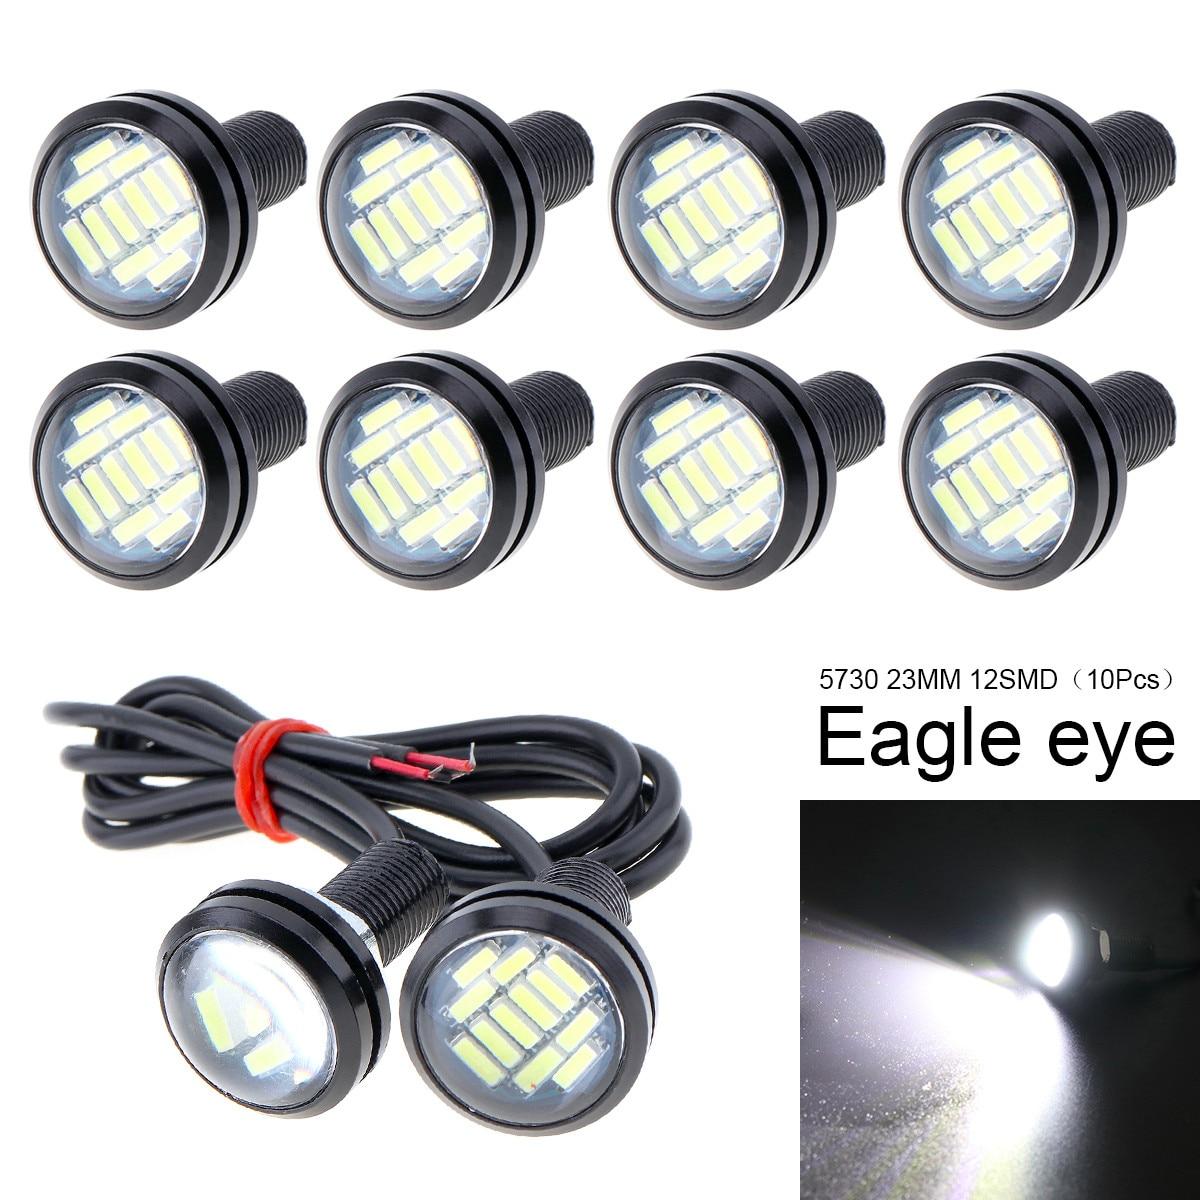 12V 9W 18mm Eagle Eye White Led Light Bulbs Car Tail Backup DRL lights QTY10 USA